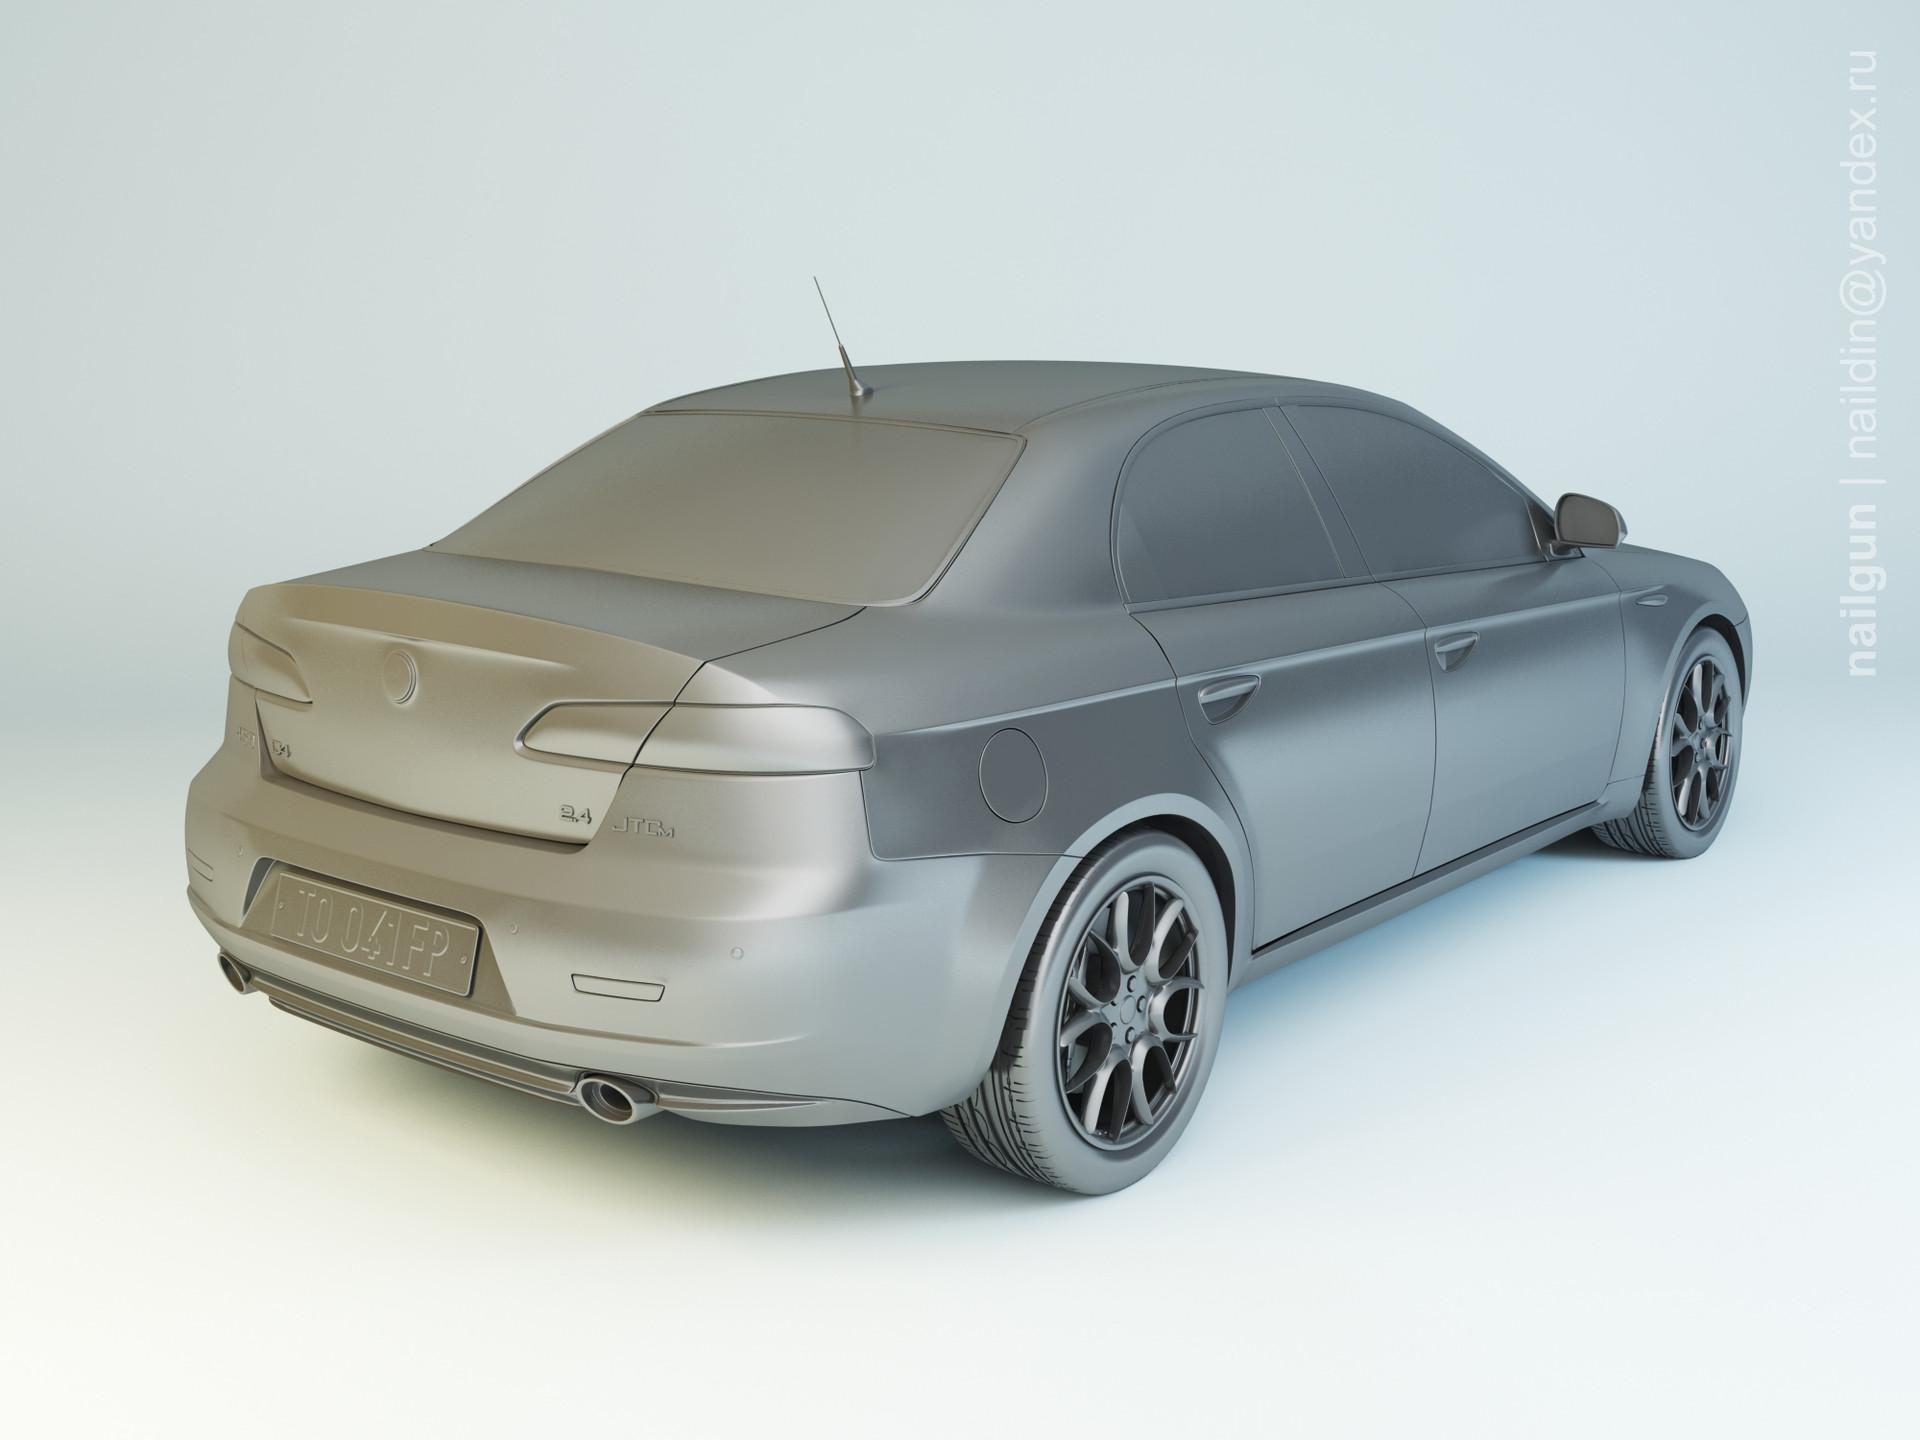 Nail khusnutdinov mpwc 044 000 alfa romeo 159 modelling 1